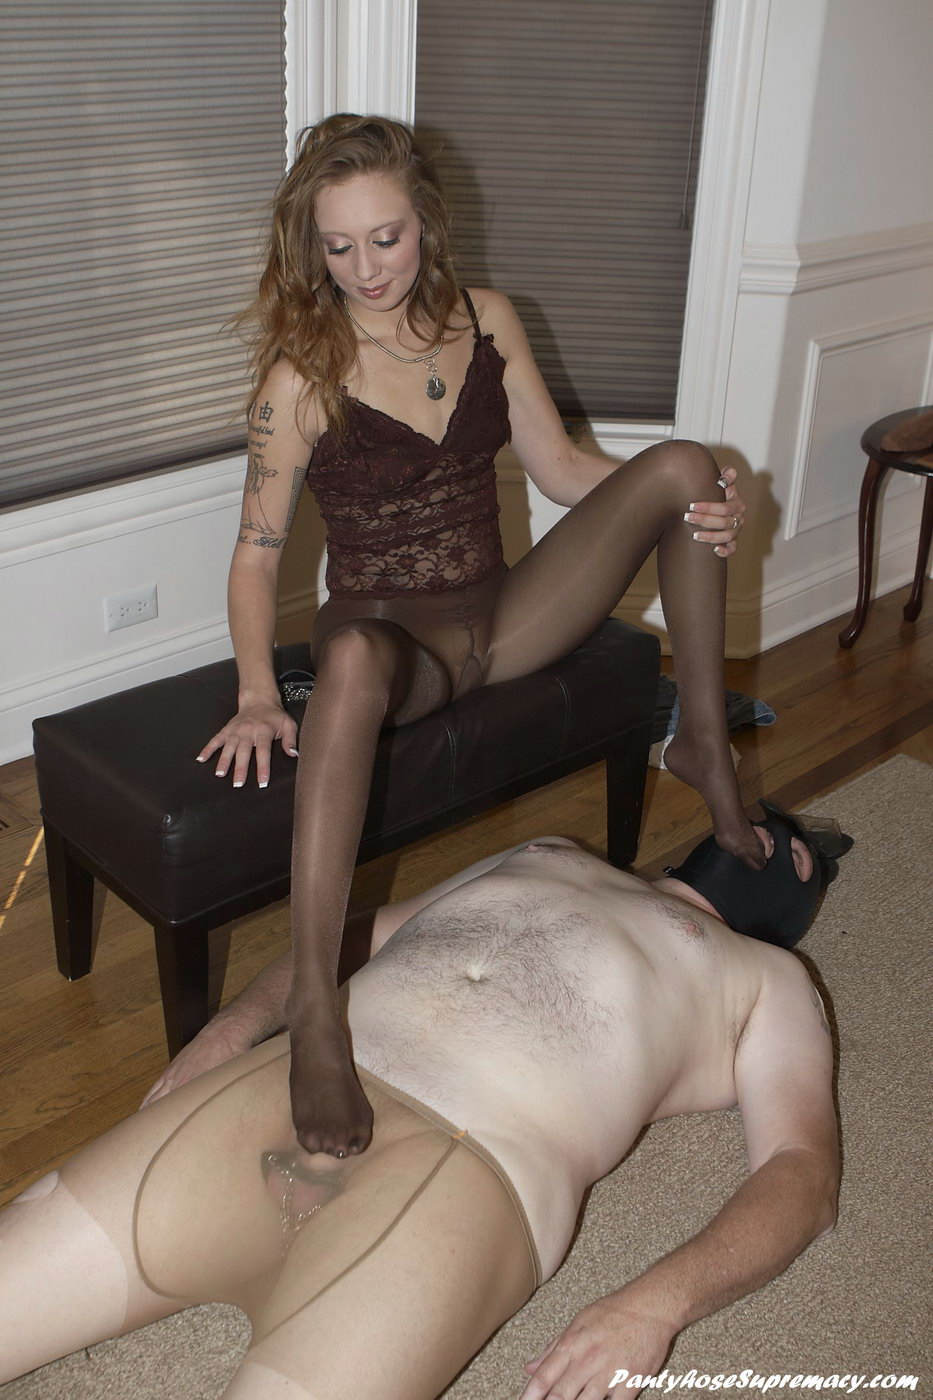 Sheer nude pantyhose on mistress